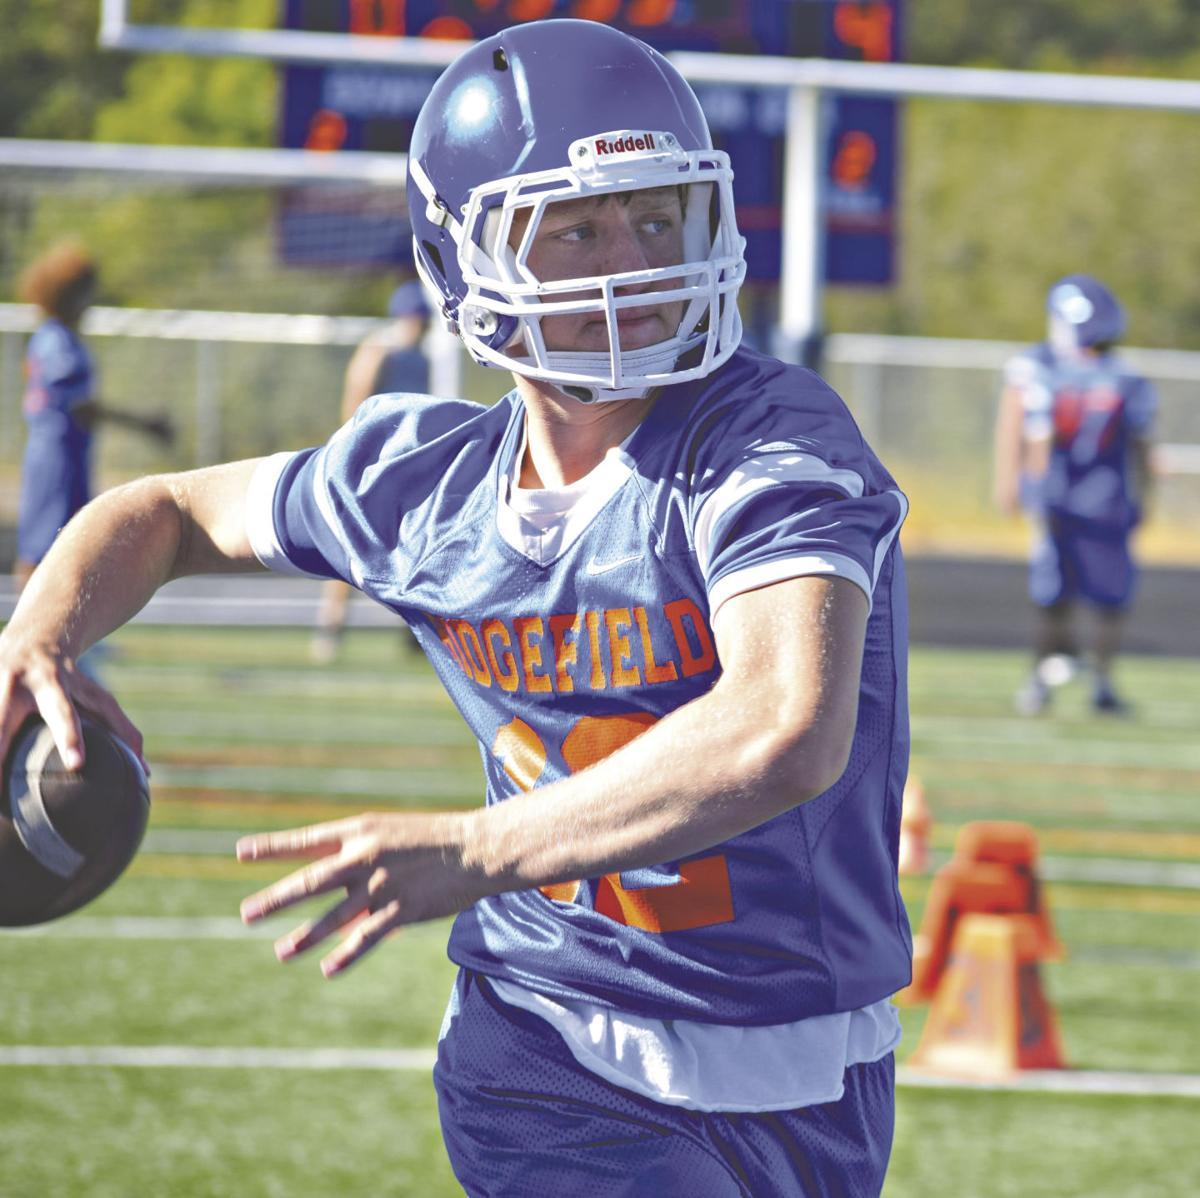 ridgefield football returning stars need supporting cast to